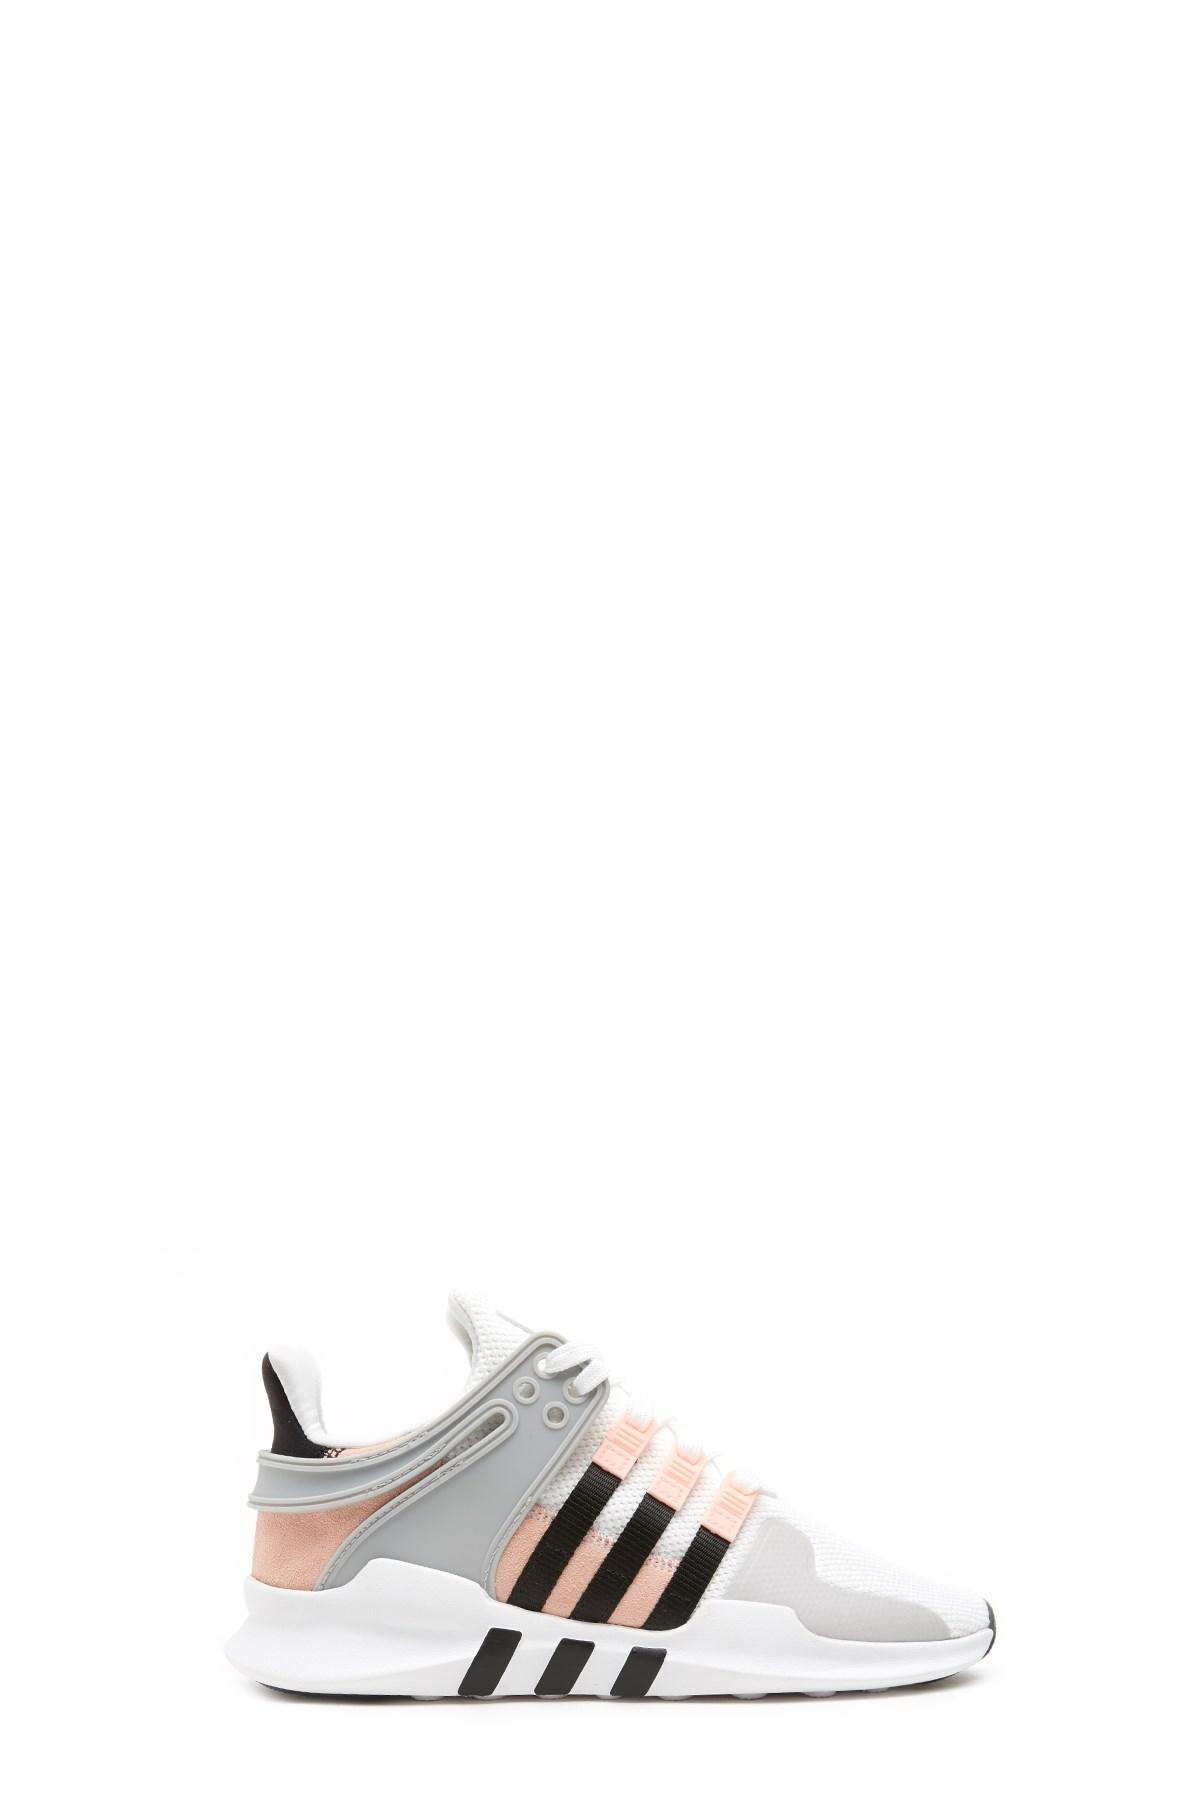 reputable site ad07a 955ae Adidas originals.  eqt support adv  sneakers